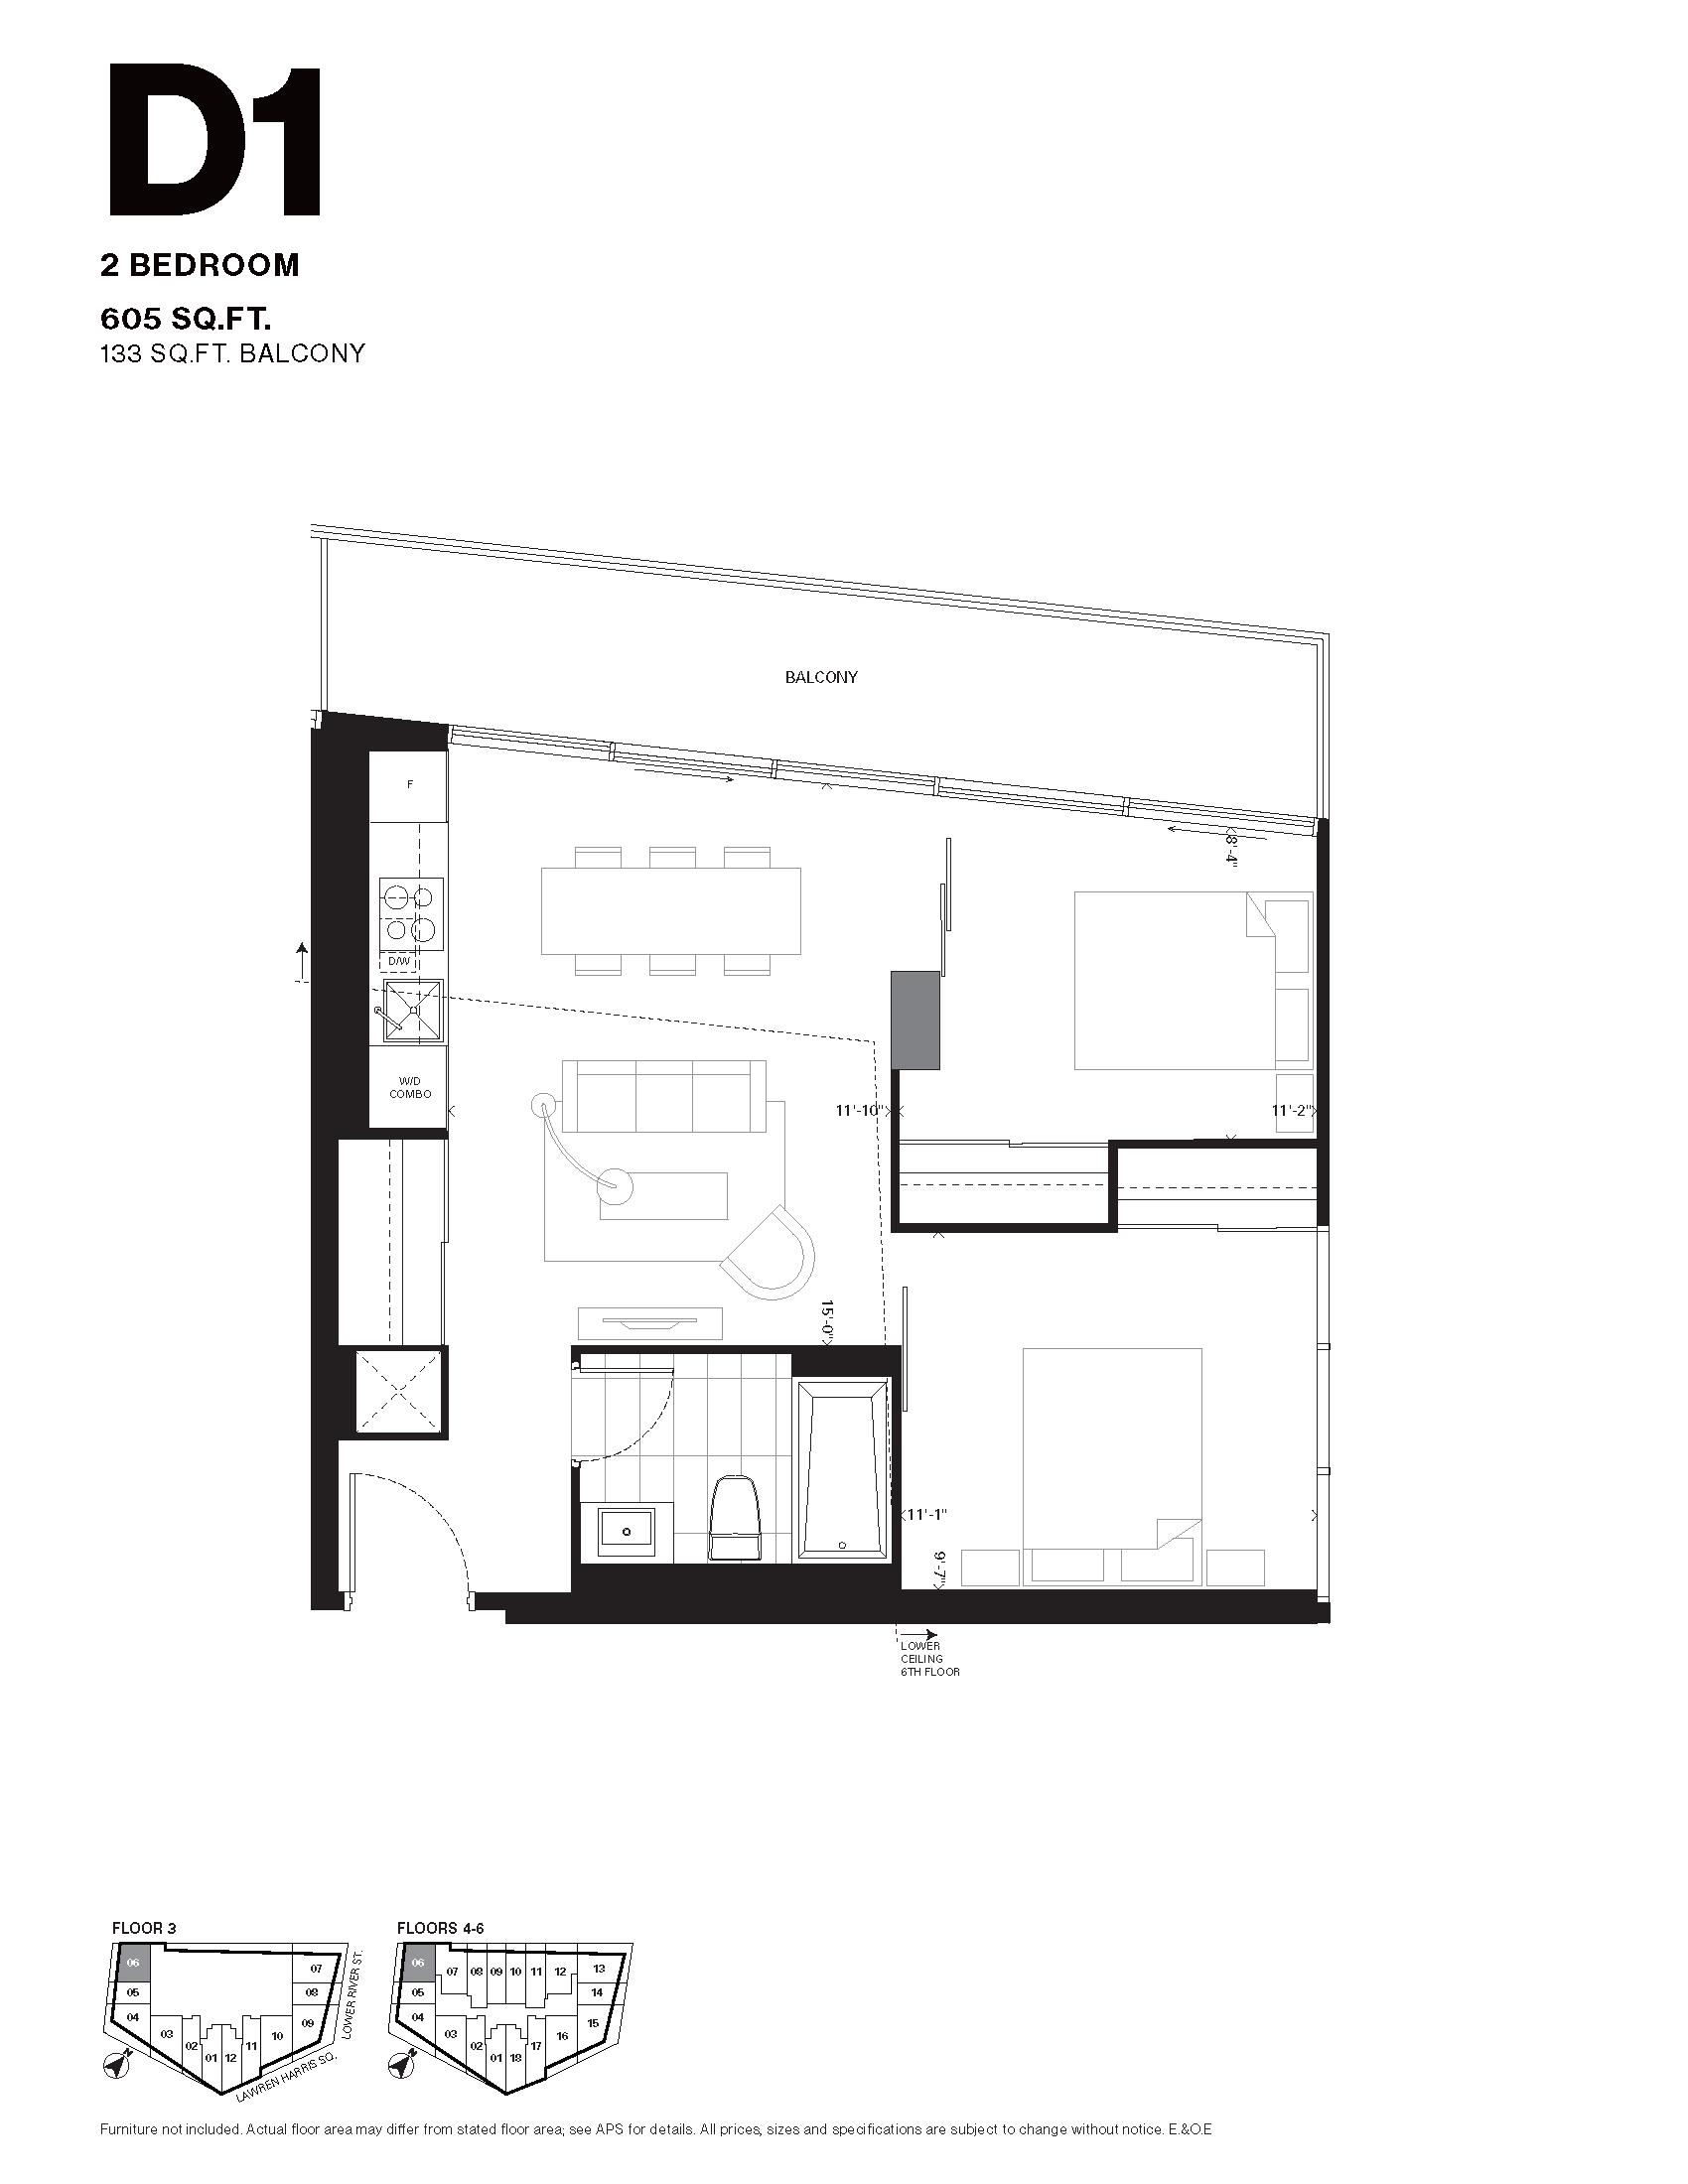 RC4-D1